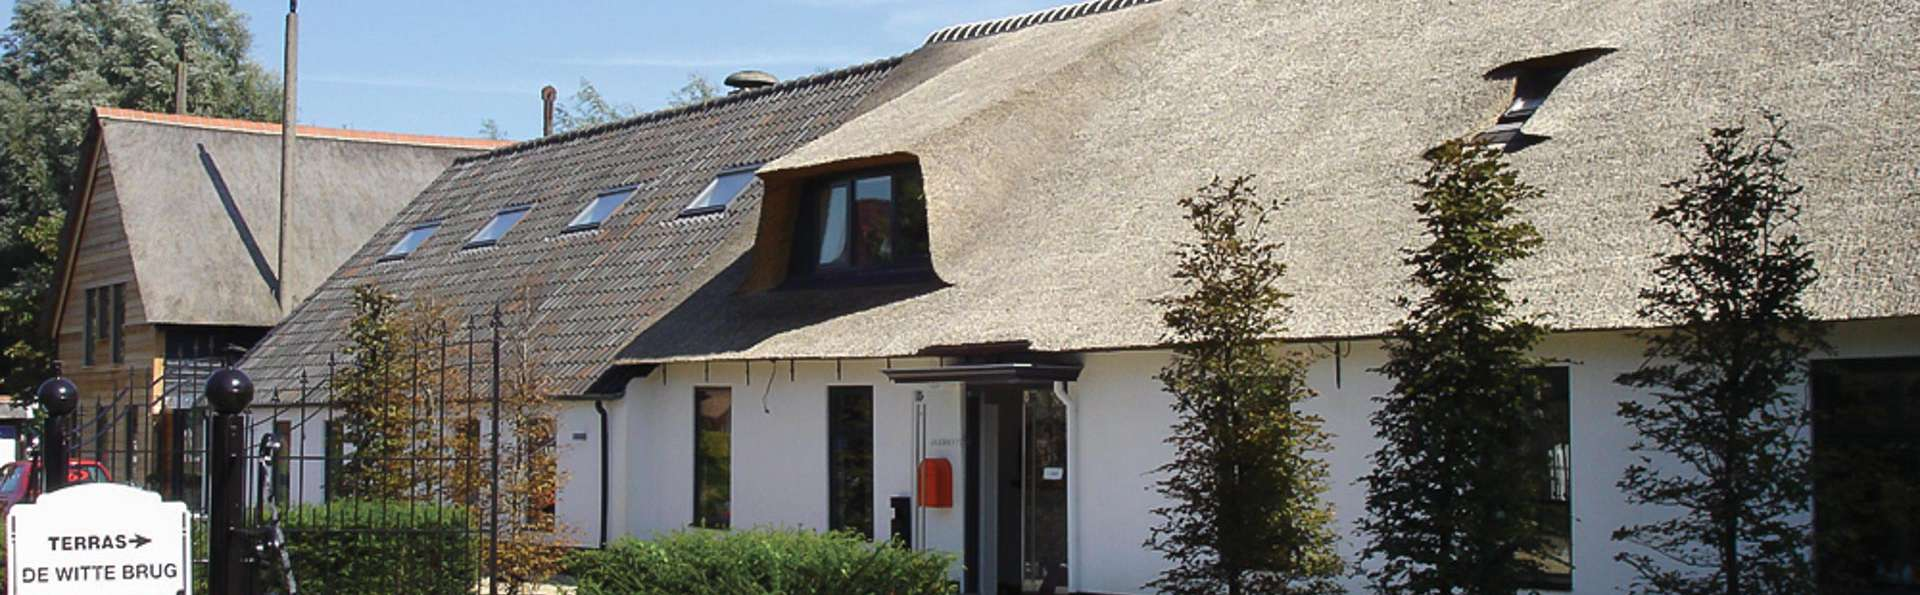 Fletcher Hotel-Restaurant de Witte Brug - EDIT_FRONT_01.jpg